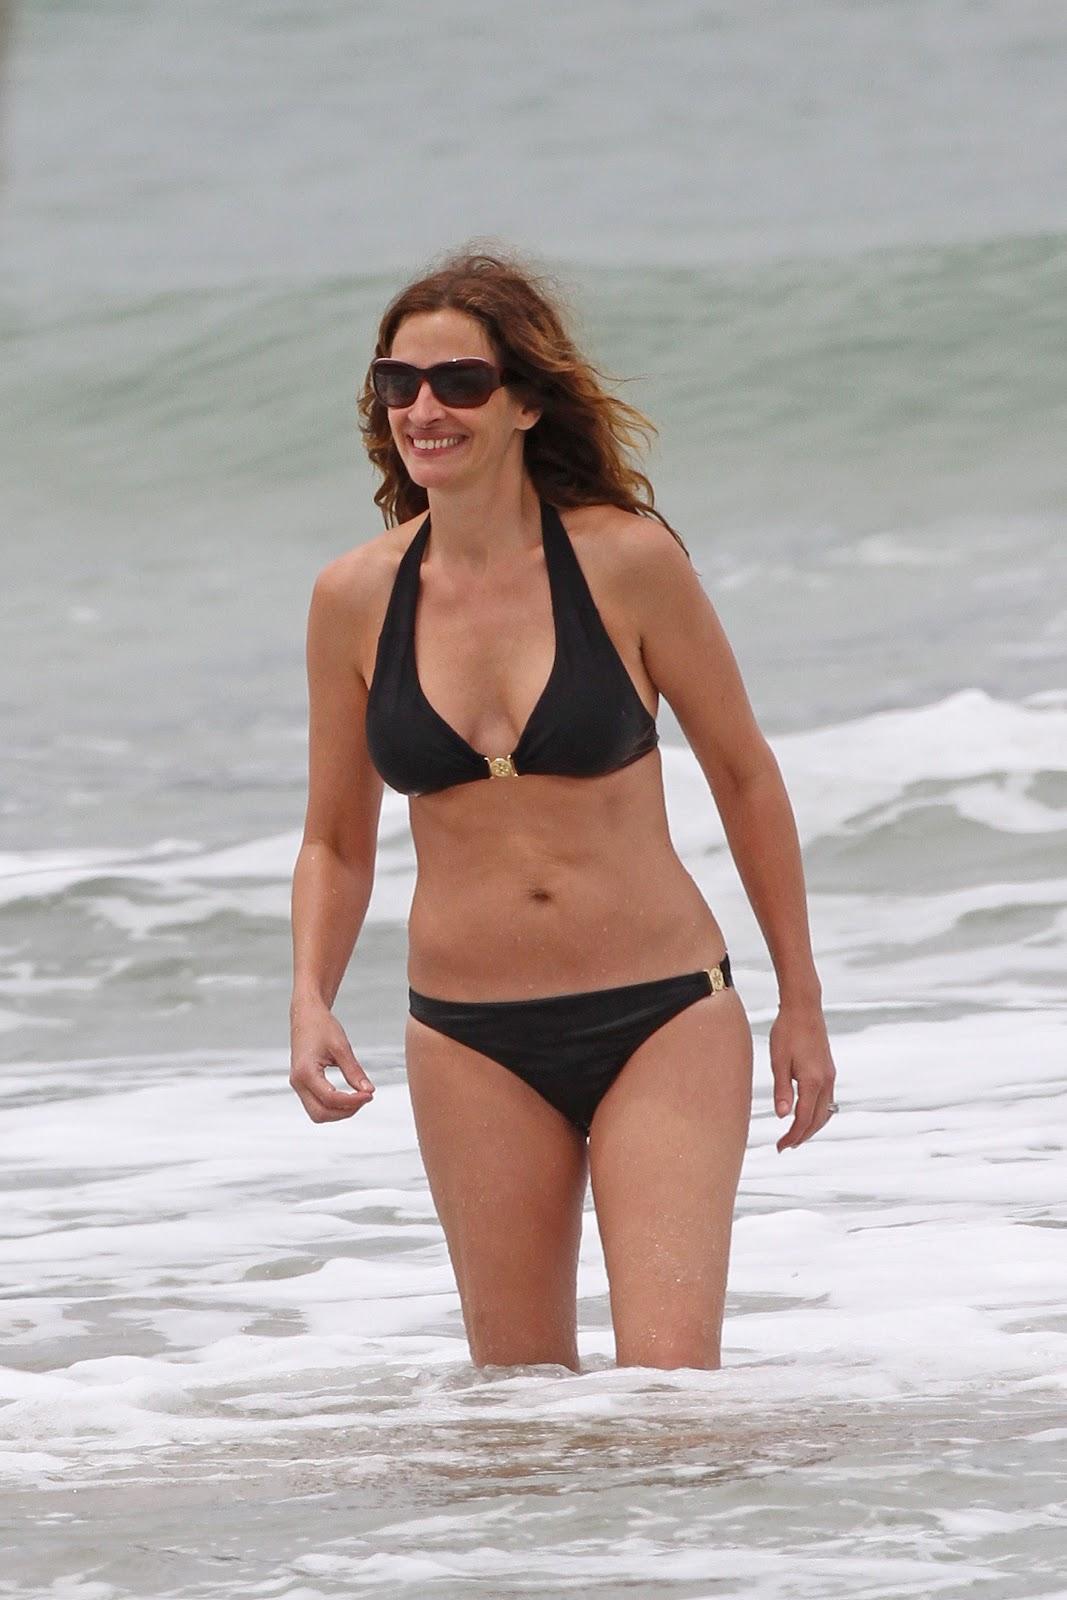 http://2.bp.blogspot.com/-NKIoU_wTw2E/T8DuJLdmj6I/AAAAAAAAHJo/0I3henGGvkY/s1600/+Julia+Roberts+-+Bikini+candids+Hawaii+%2828%29.jpg